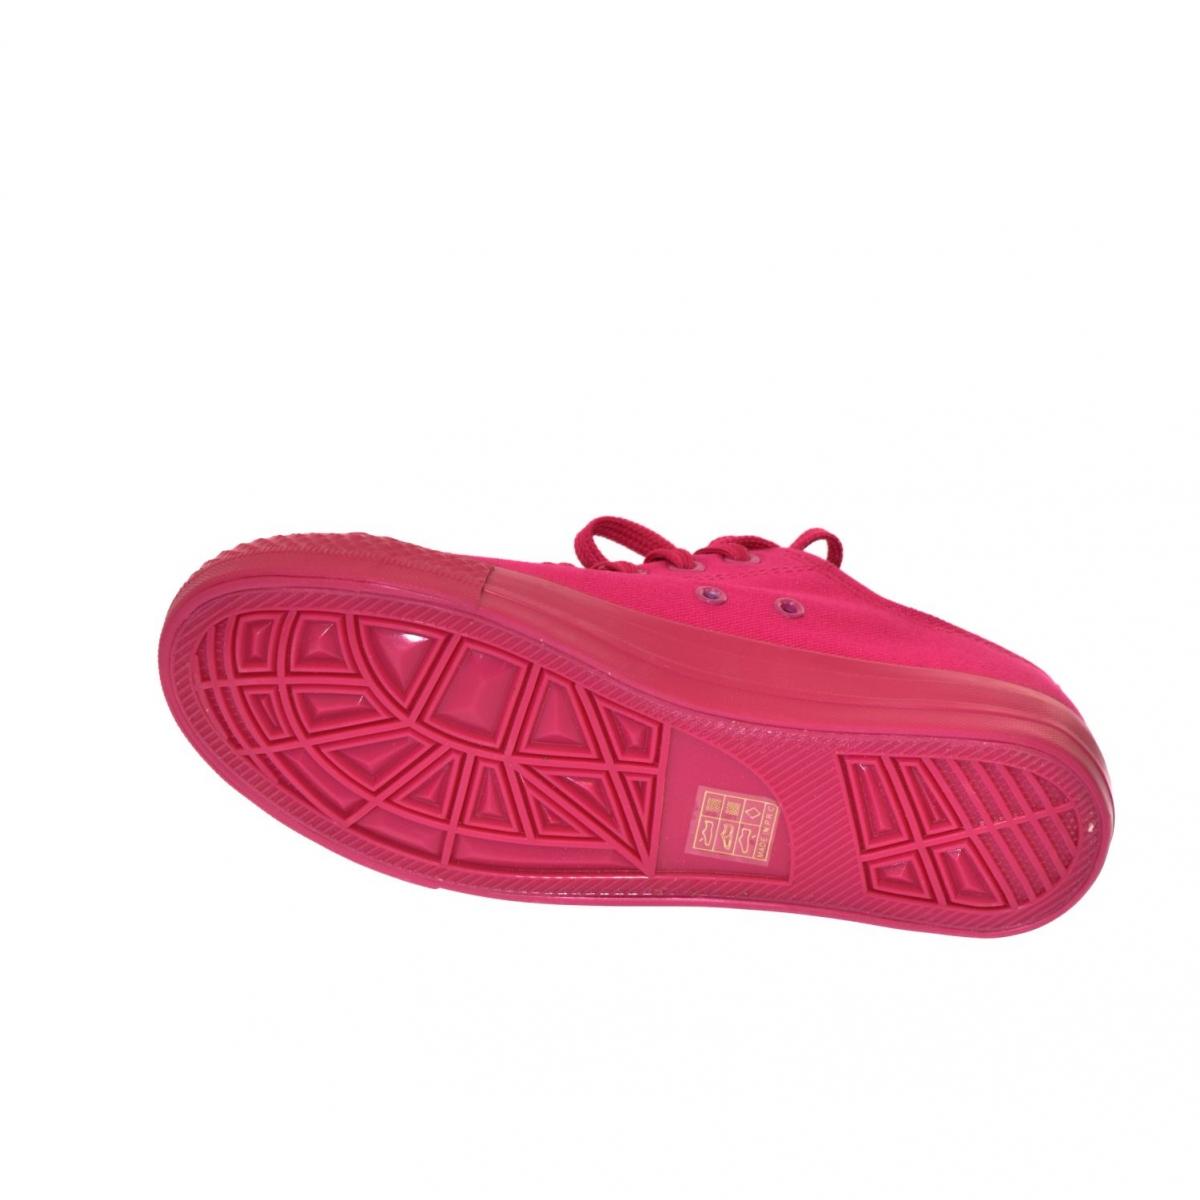 8765a2b90998 Dámske ružové tenisky REINA - 5